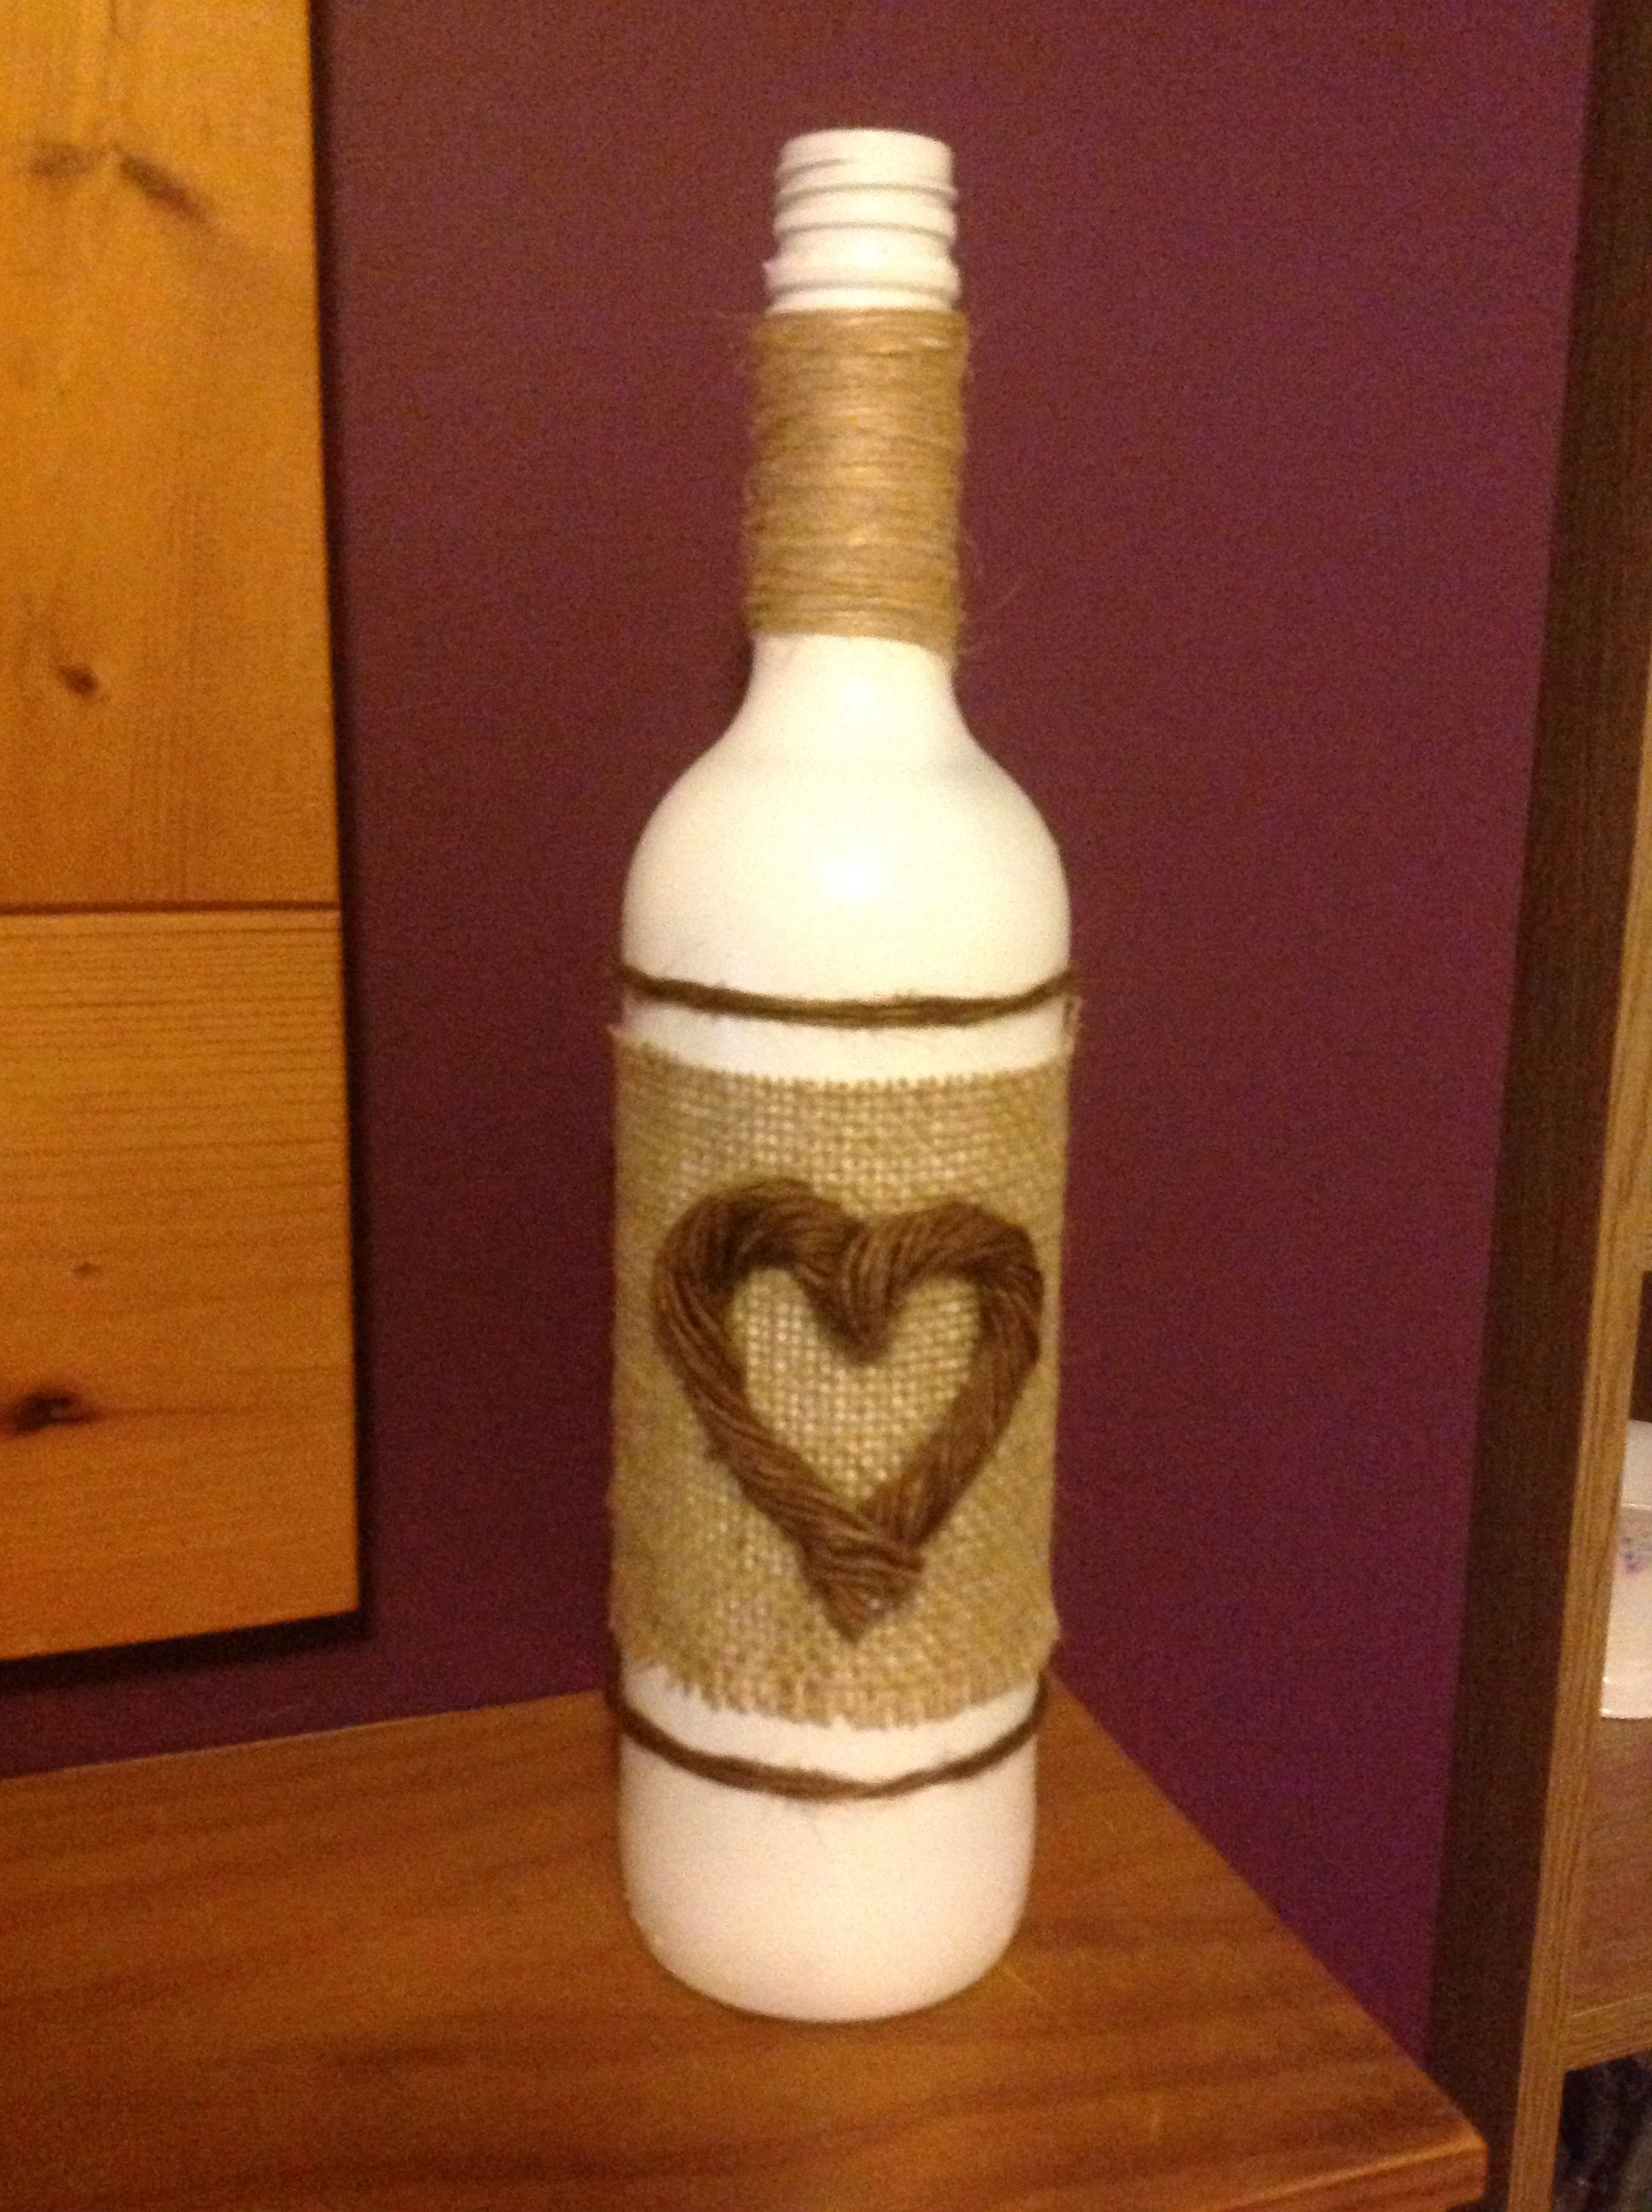 Hessian Covered Wine Bottle With Heart Butylka Podelki Butylka Podelki